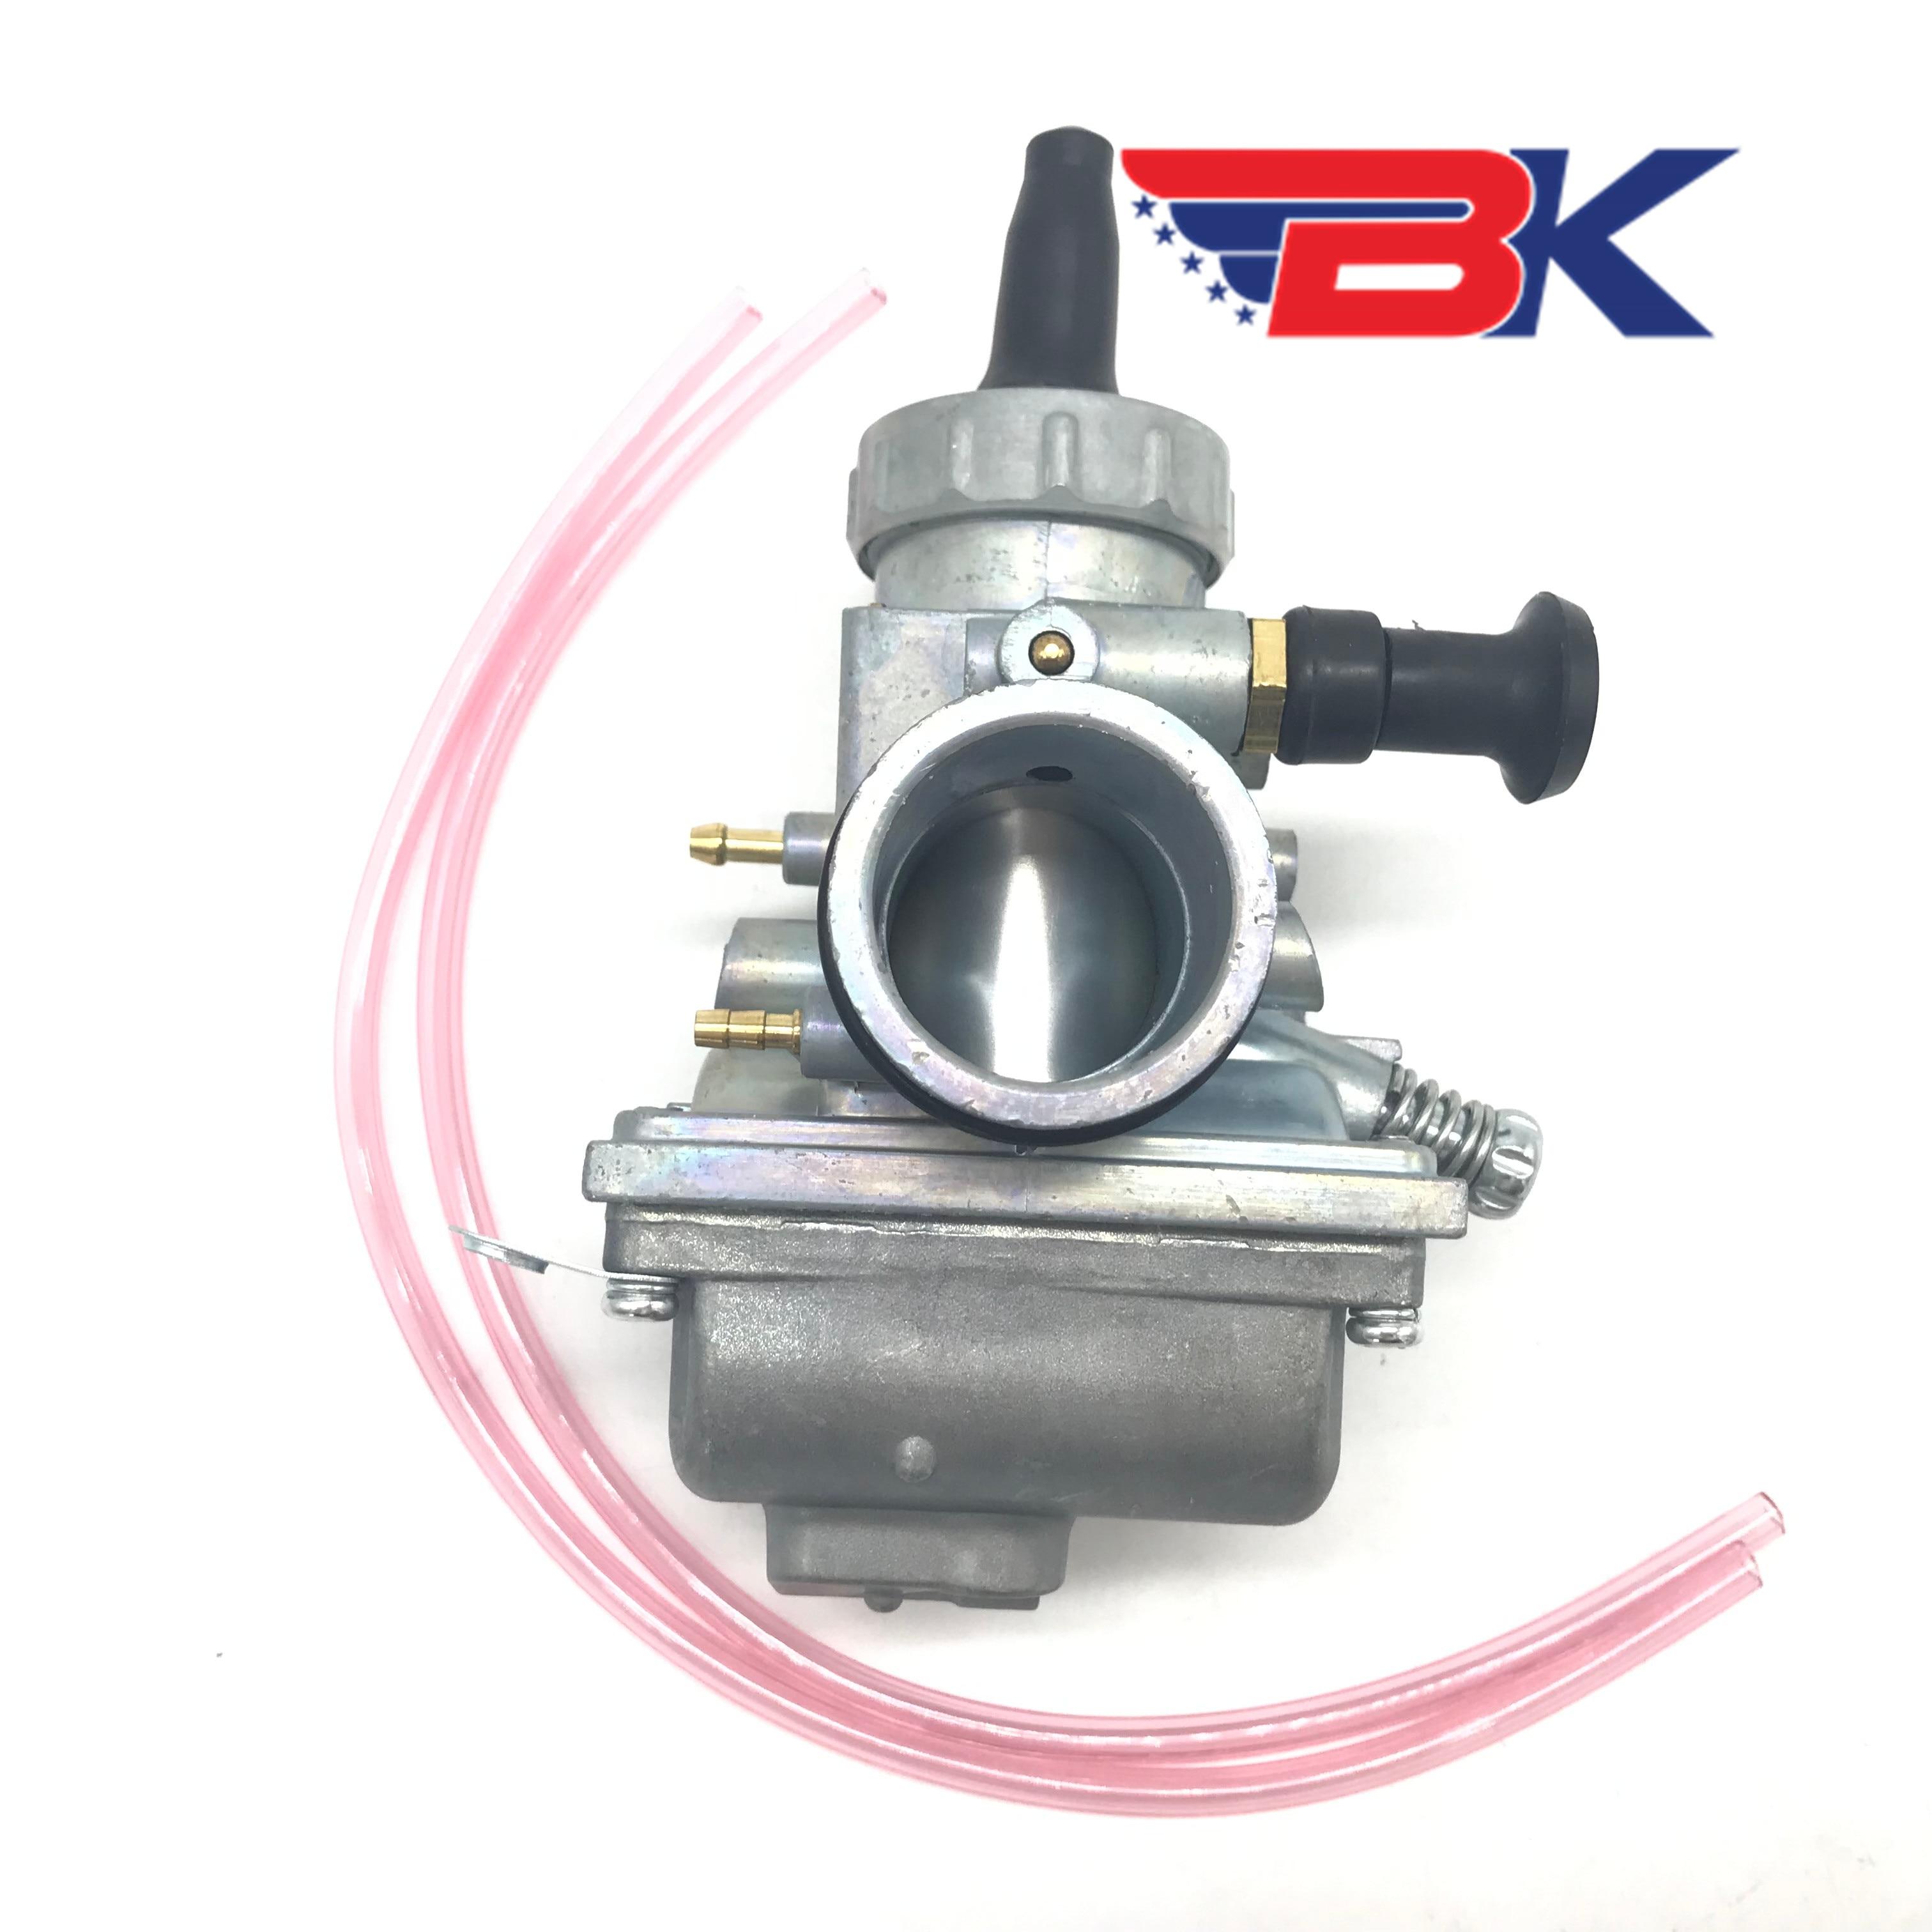 MIKUNI Carburetor NY125 RXT115 RX100 RX135 RX175 Engine Parts